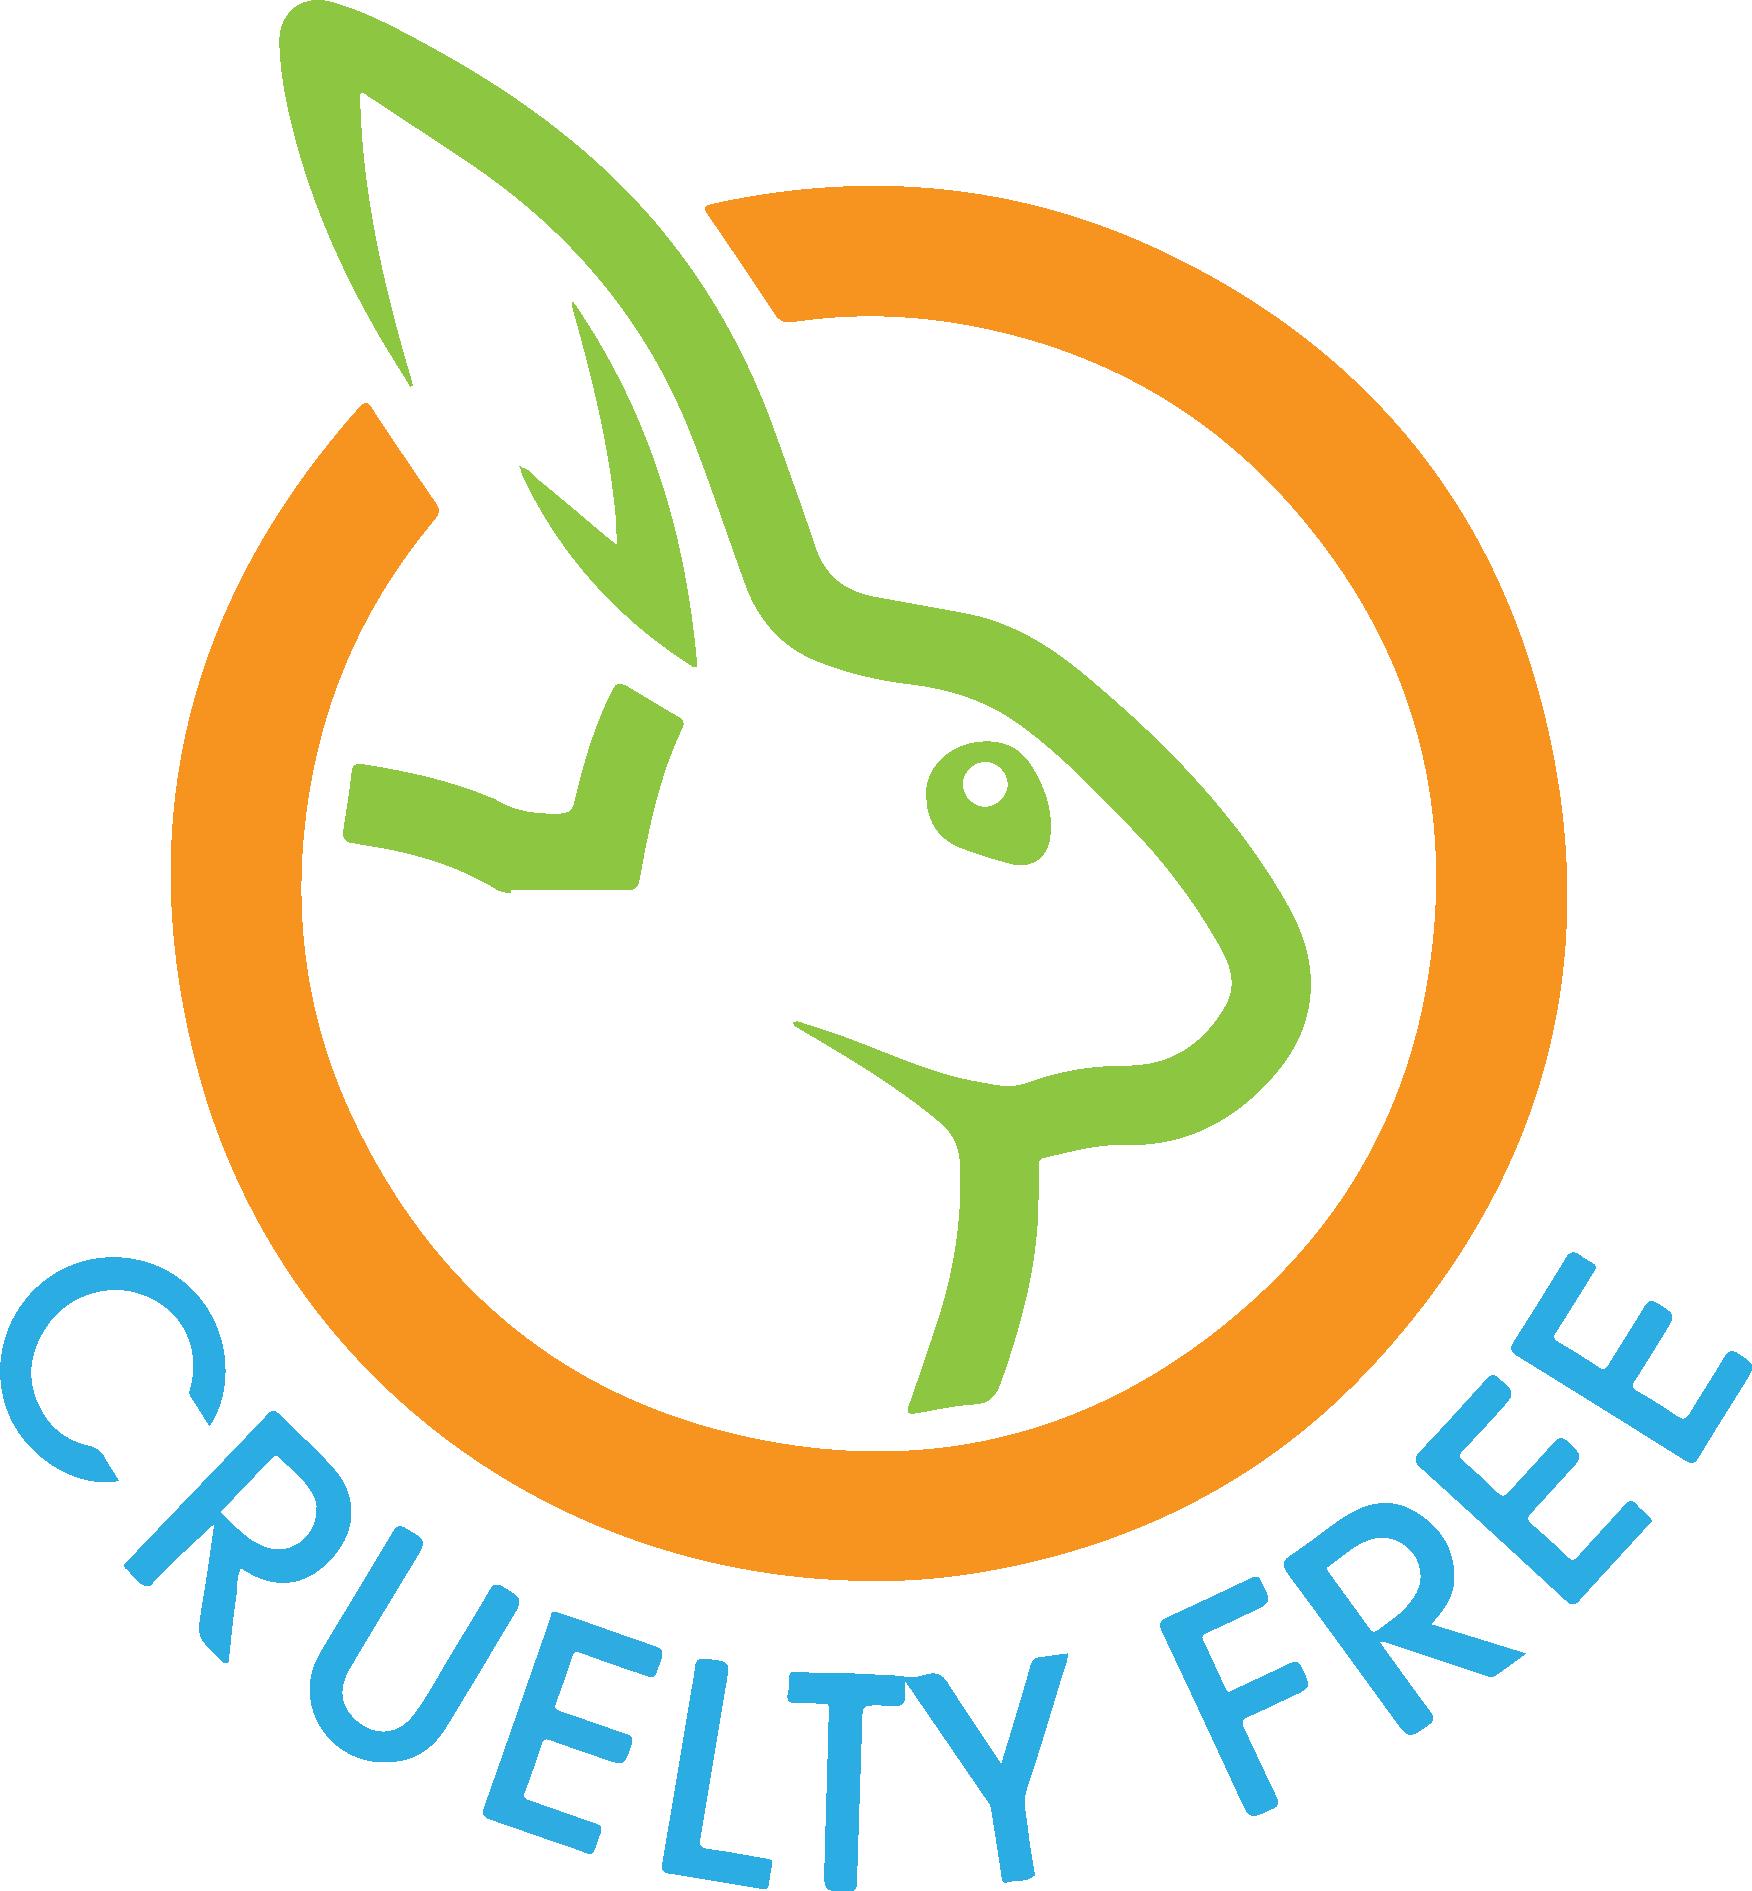 C4-CRUELTY FREE